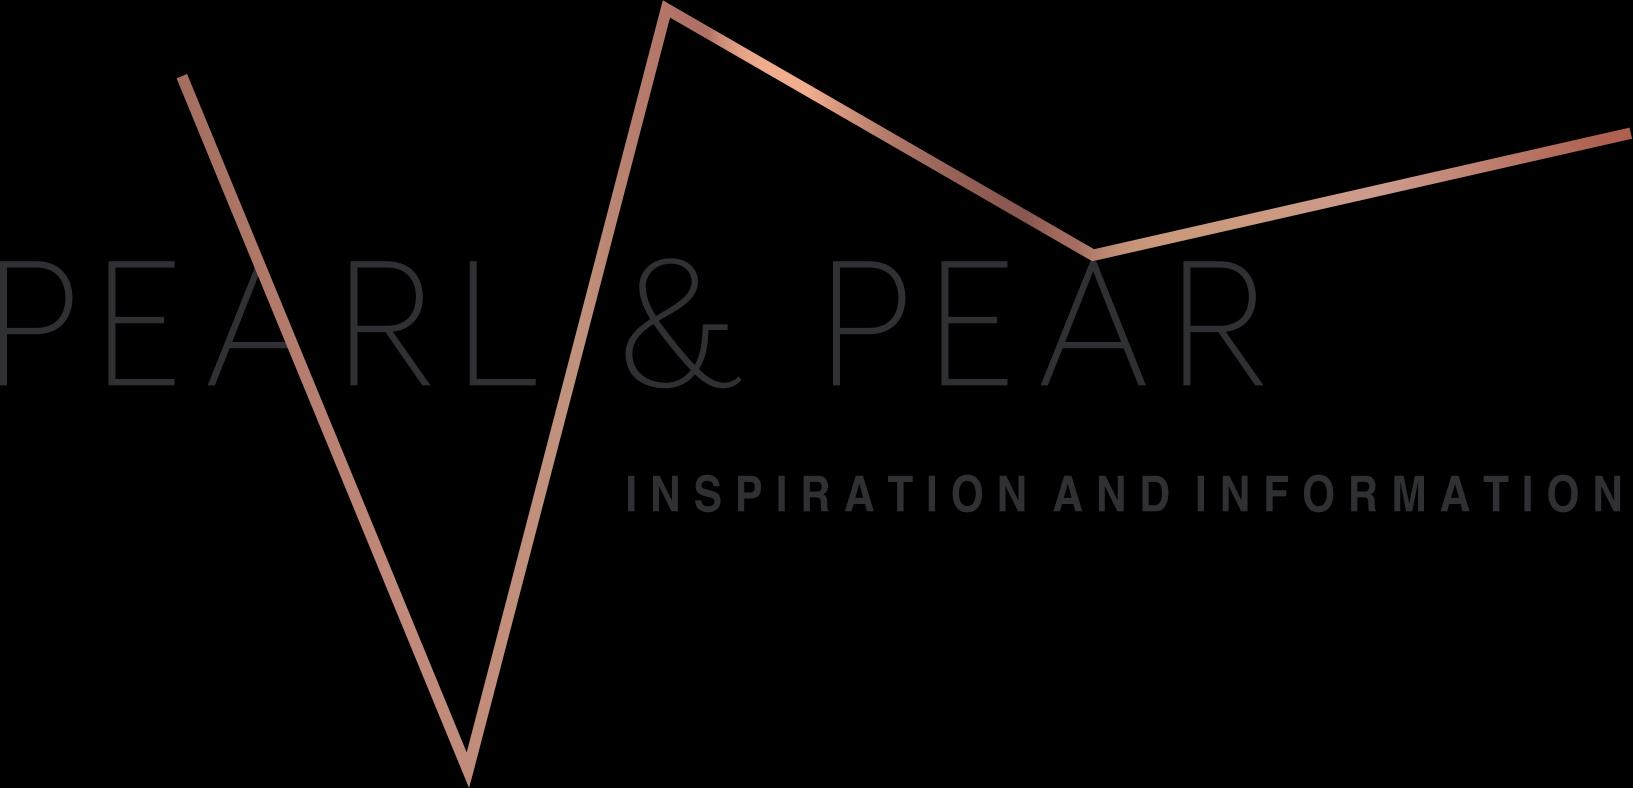 Pearl & Pear